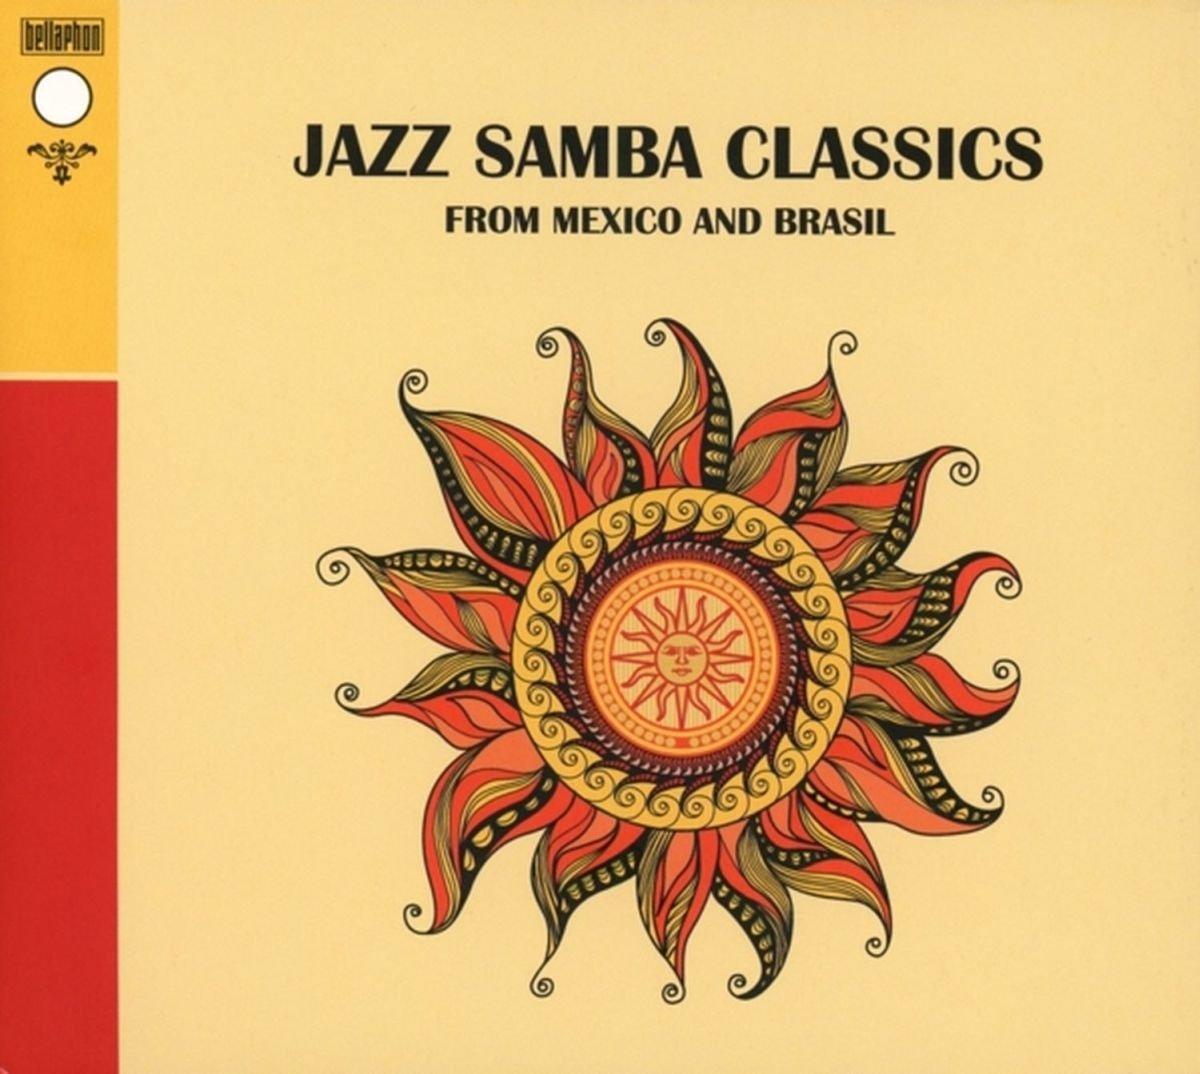 Attention brand Jazz Samba Classics Portland Mall Mex from